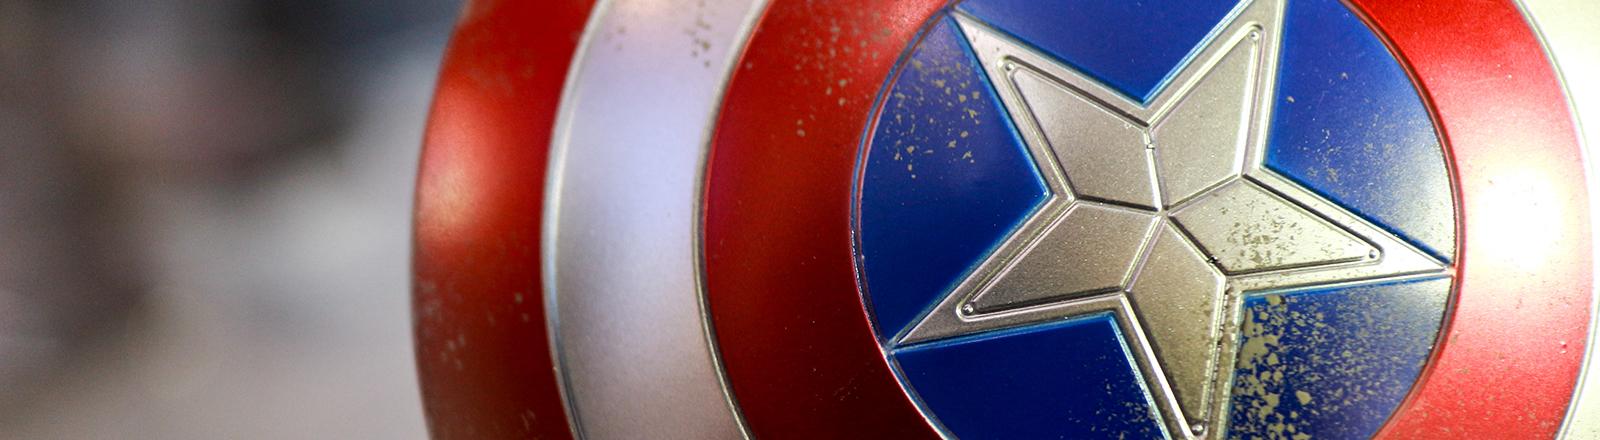 Das Schild des Marvel-Charakters Captain America.